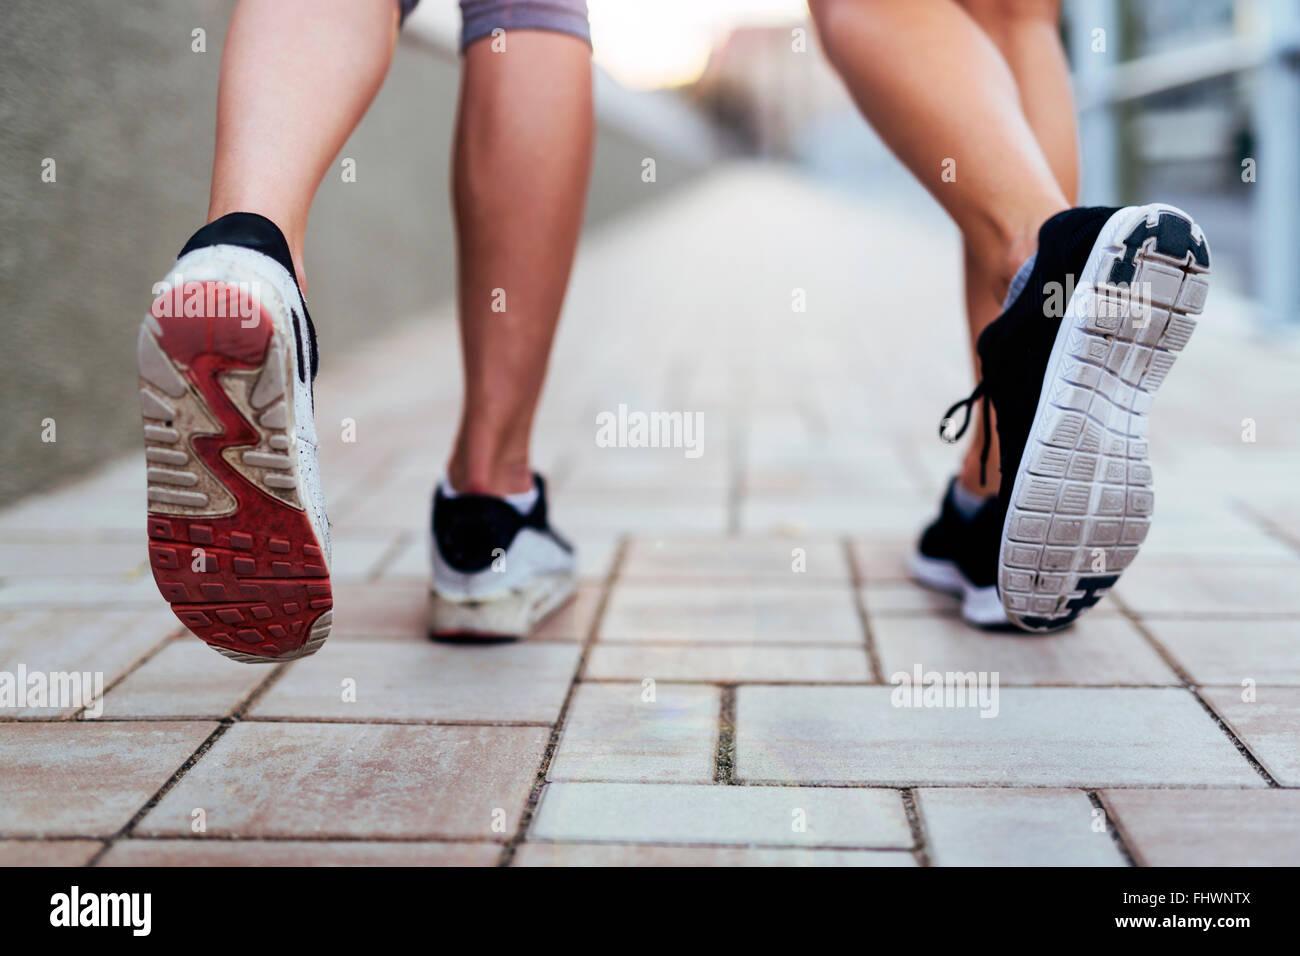 Jogging athletic donne - closeup sulle gambe Immagini Stock